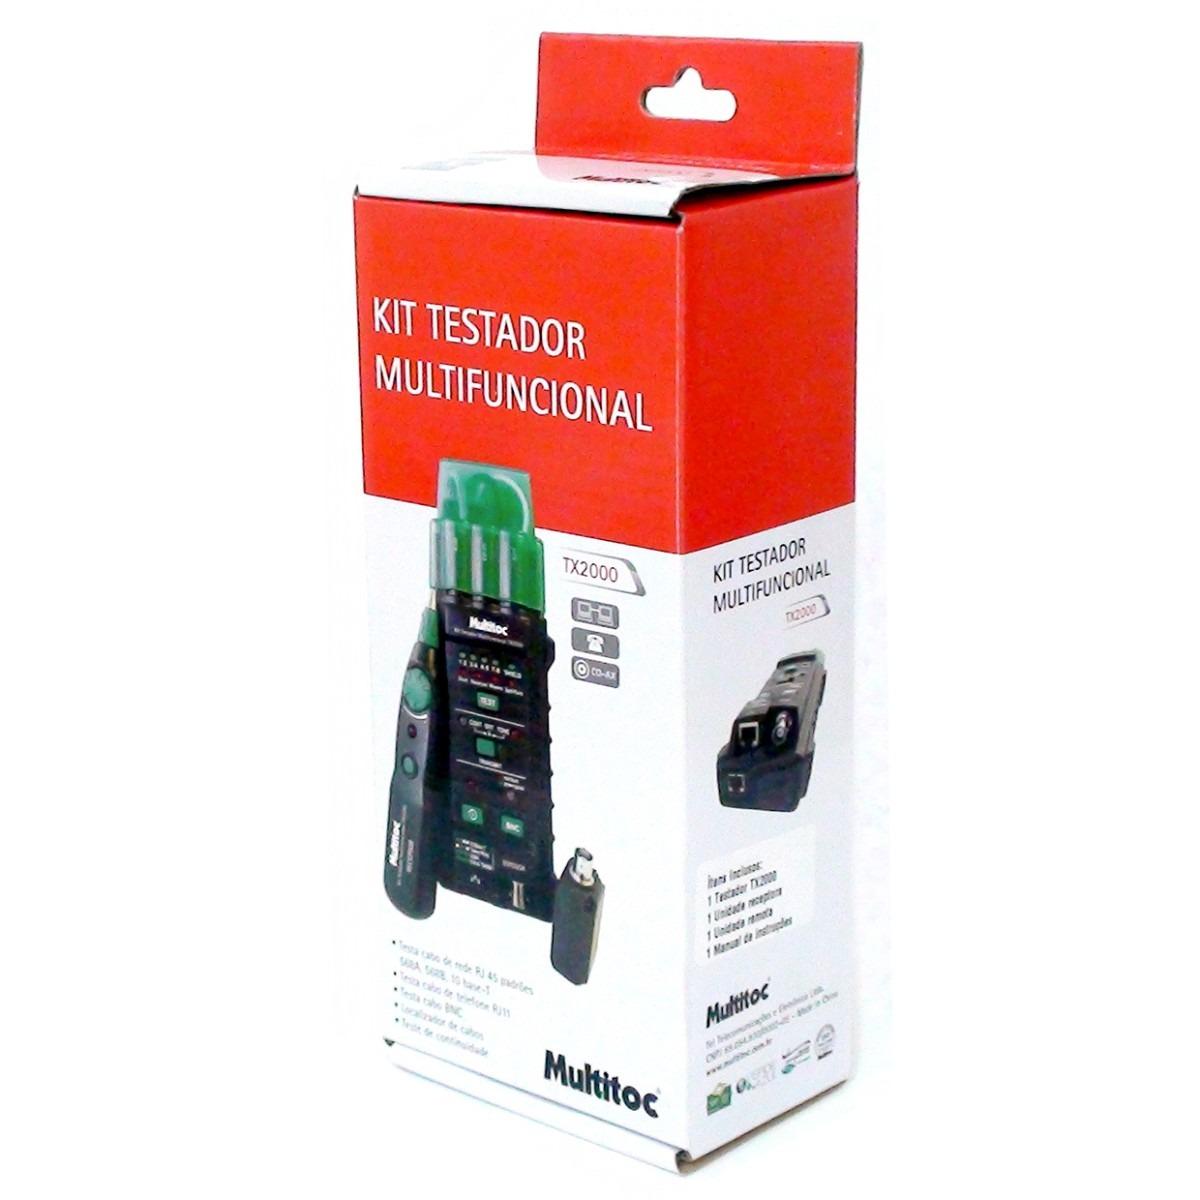 Kit Multifuncional Testador e Localizador de Cabos de Rede, Telefone e BNC TX 2000